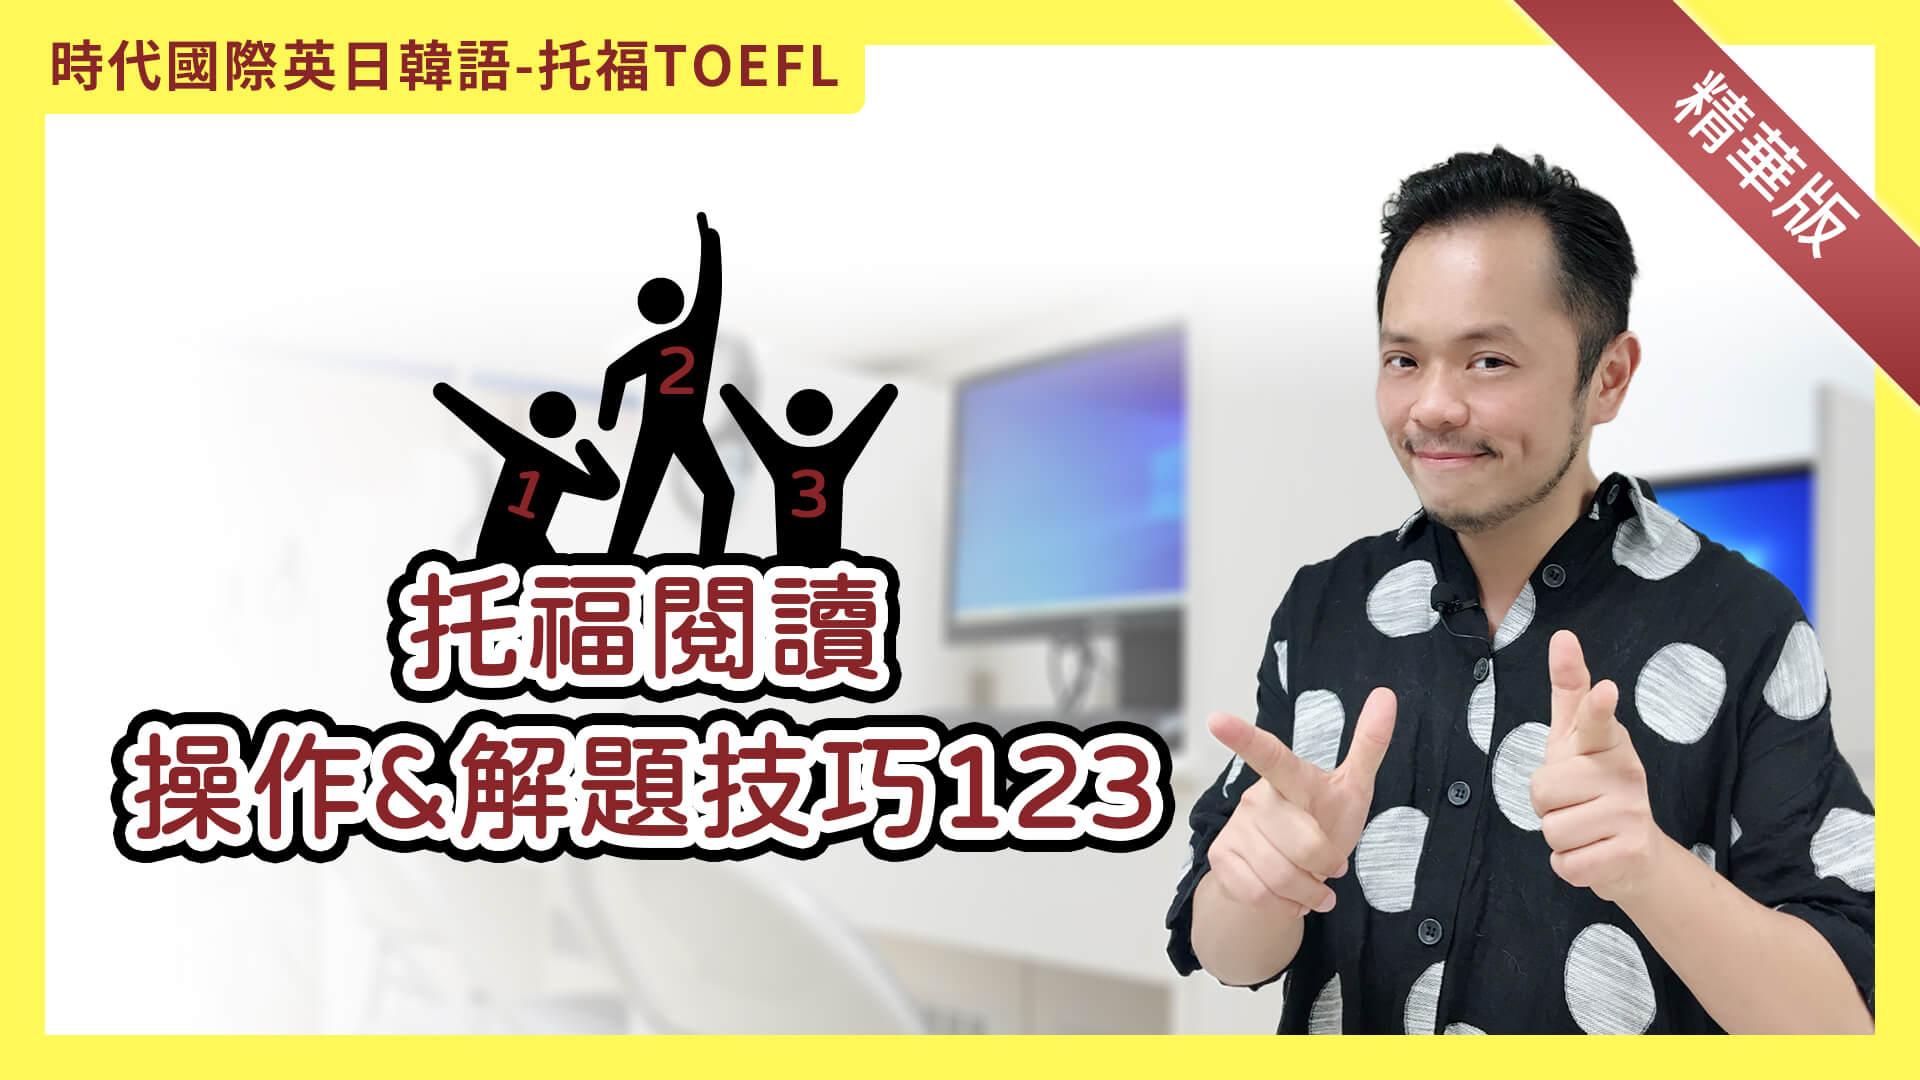 TOEFL托福閱讀 操作&解題技巧123